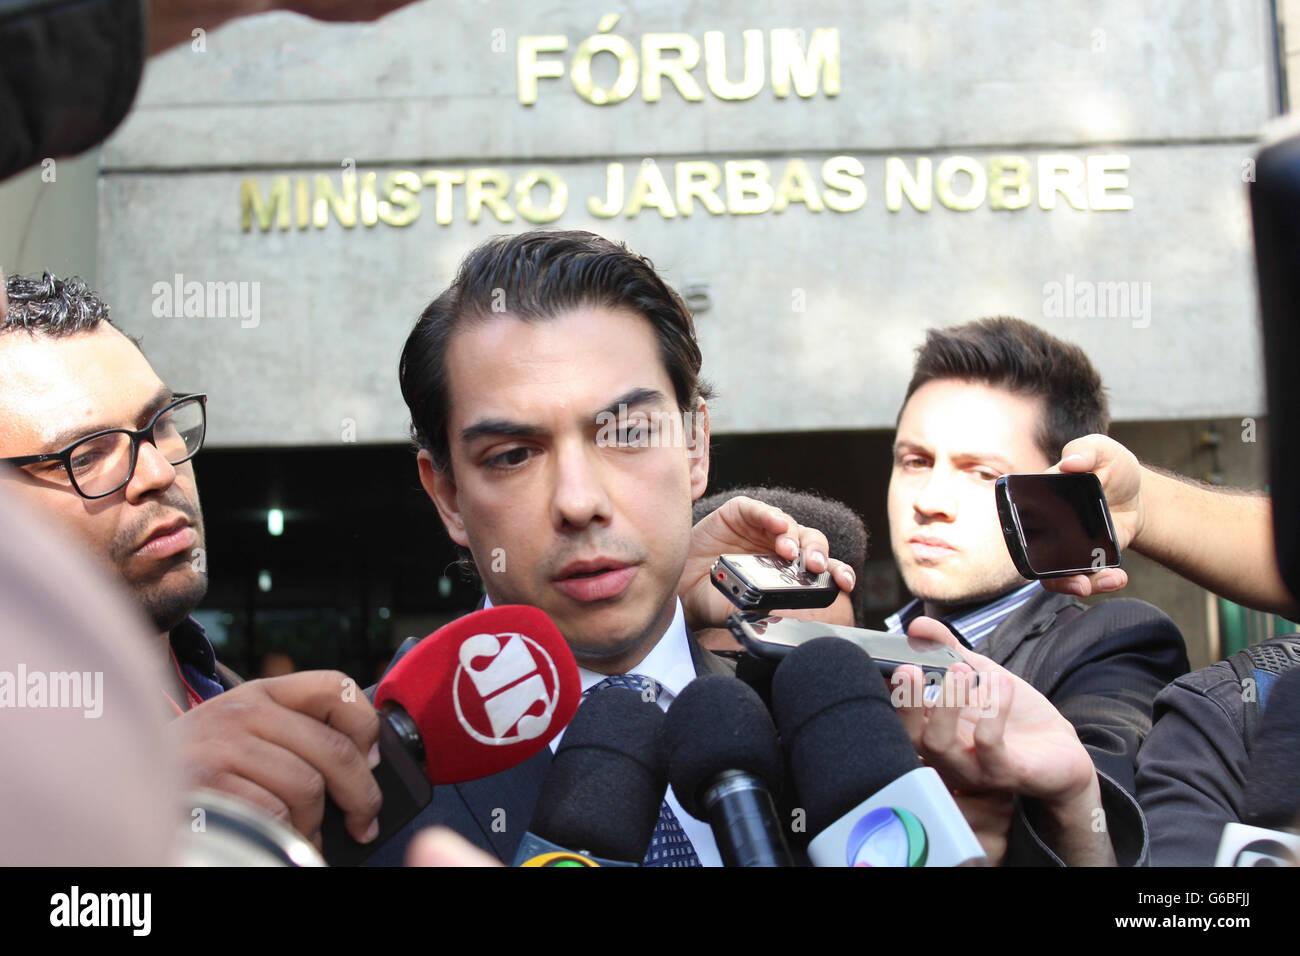 SAO PAULO, Brazil - 06/24/2016: PROSECUTOR GIVES RODRIGO GRANDIS COLLECTIVE - The prosecutor Rodrigo de Grandis - Stock Image